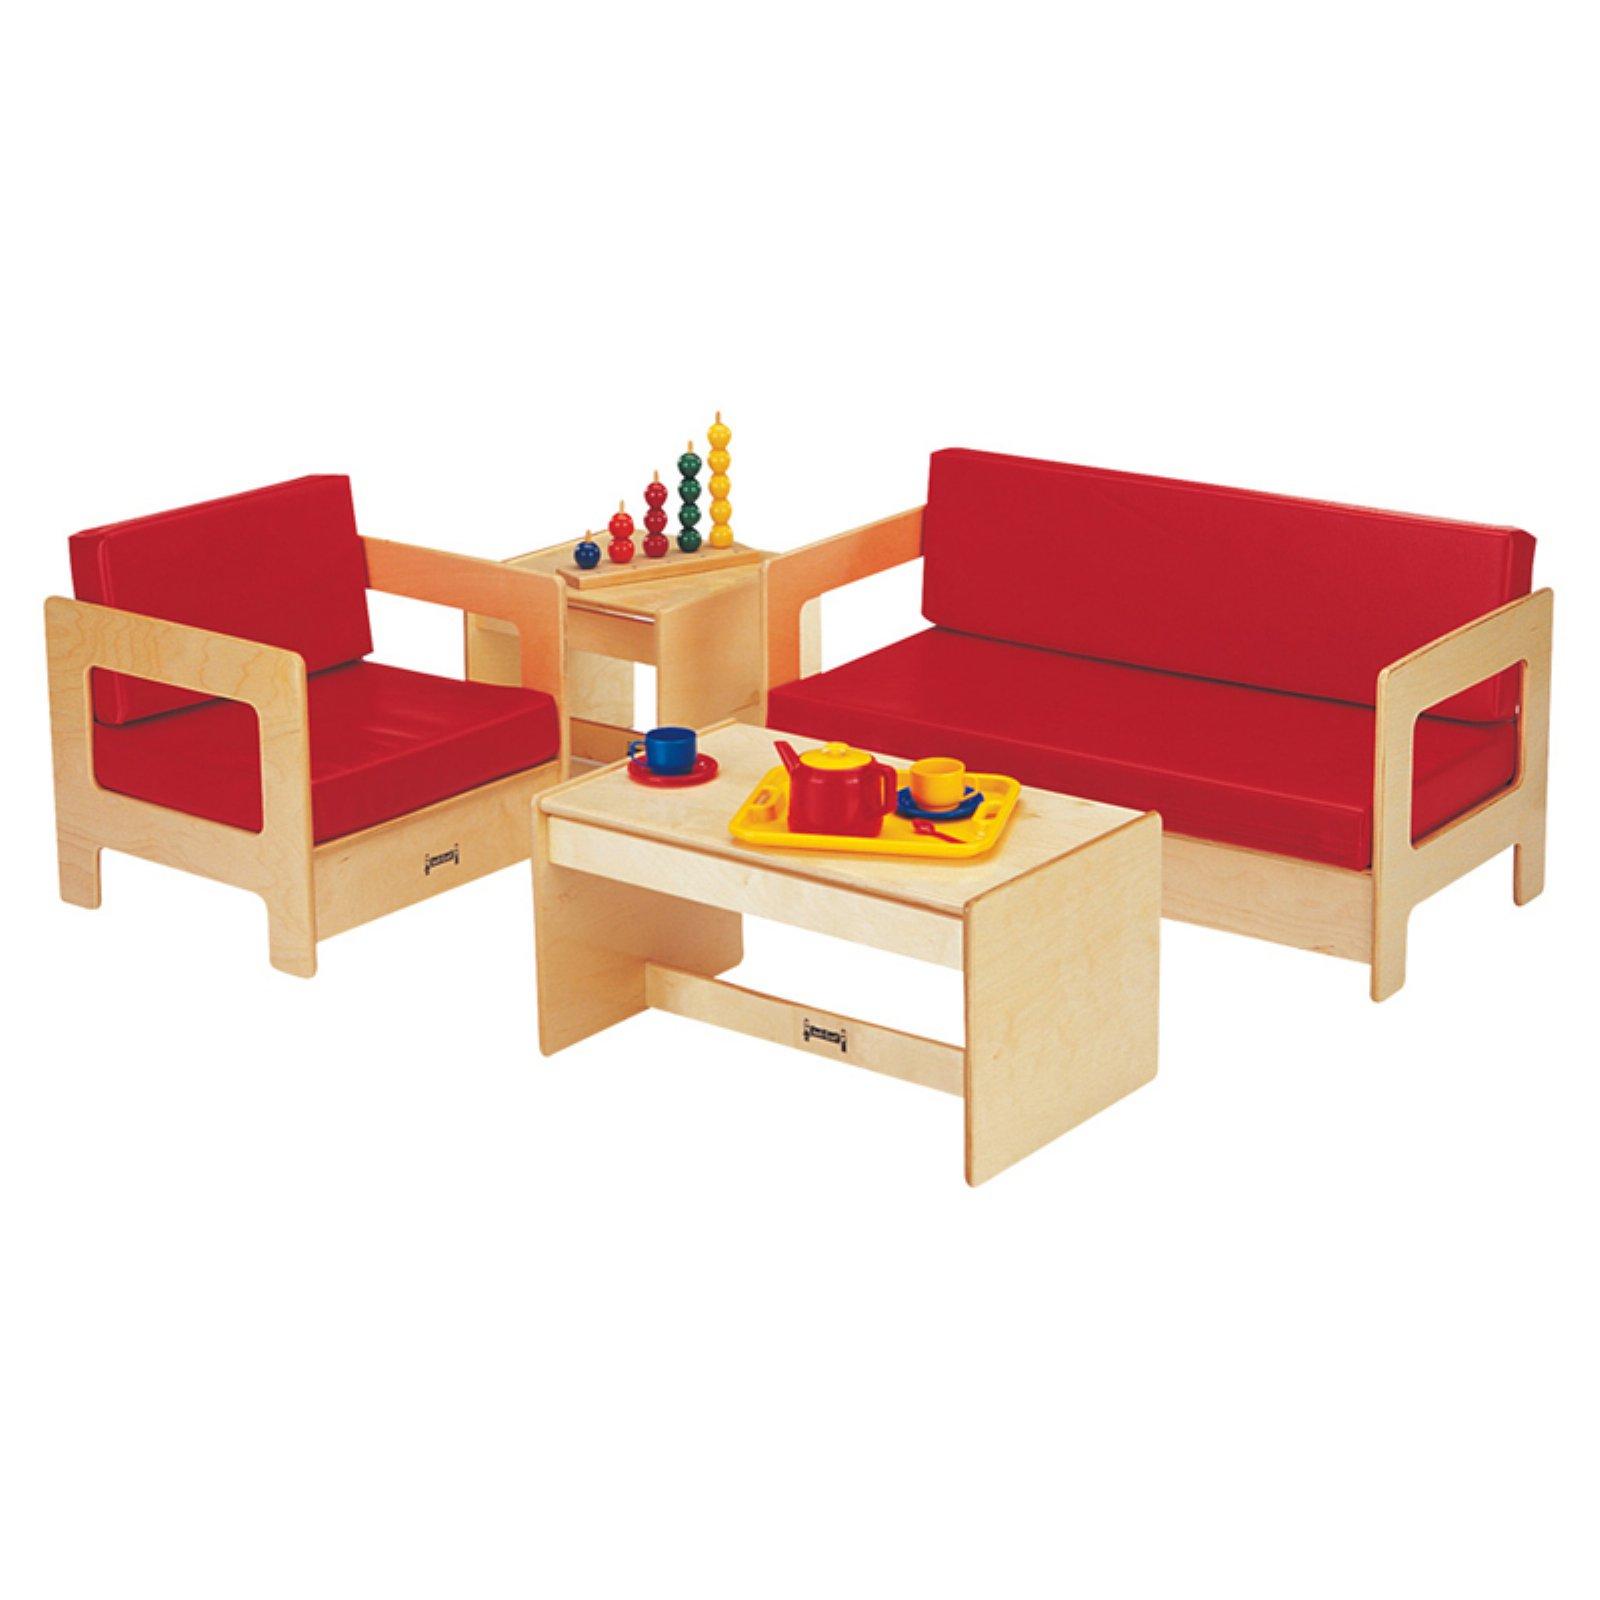 Jonti-Craft Living Room Set - 4 Piece